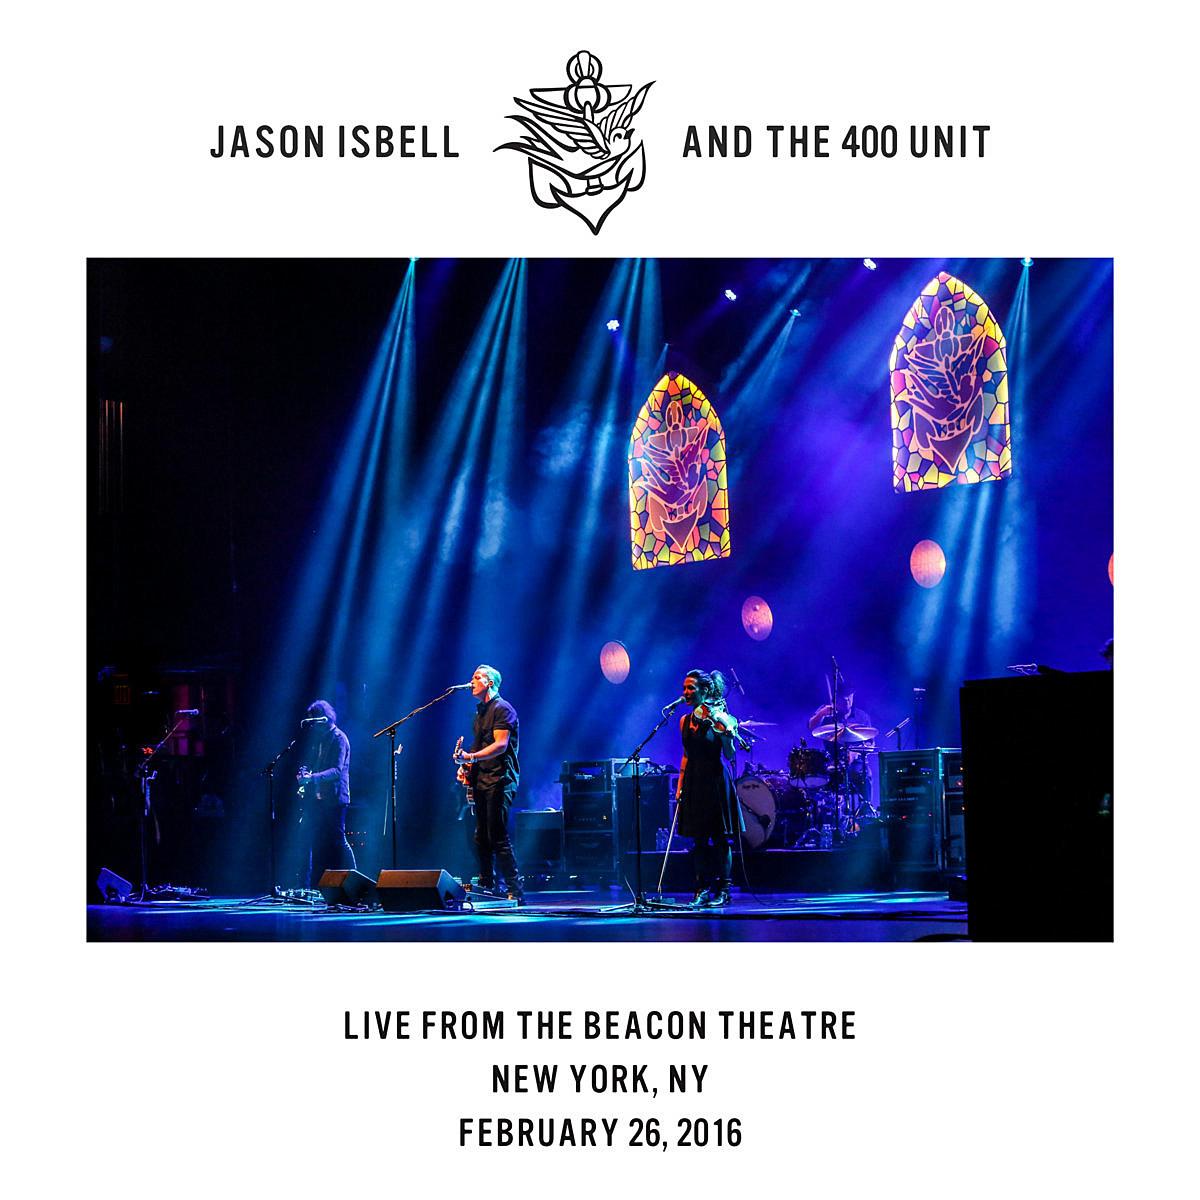 Jason Isbell releases live album of 2016 Beacon Theatre show